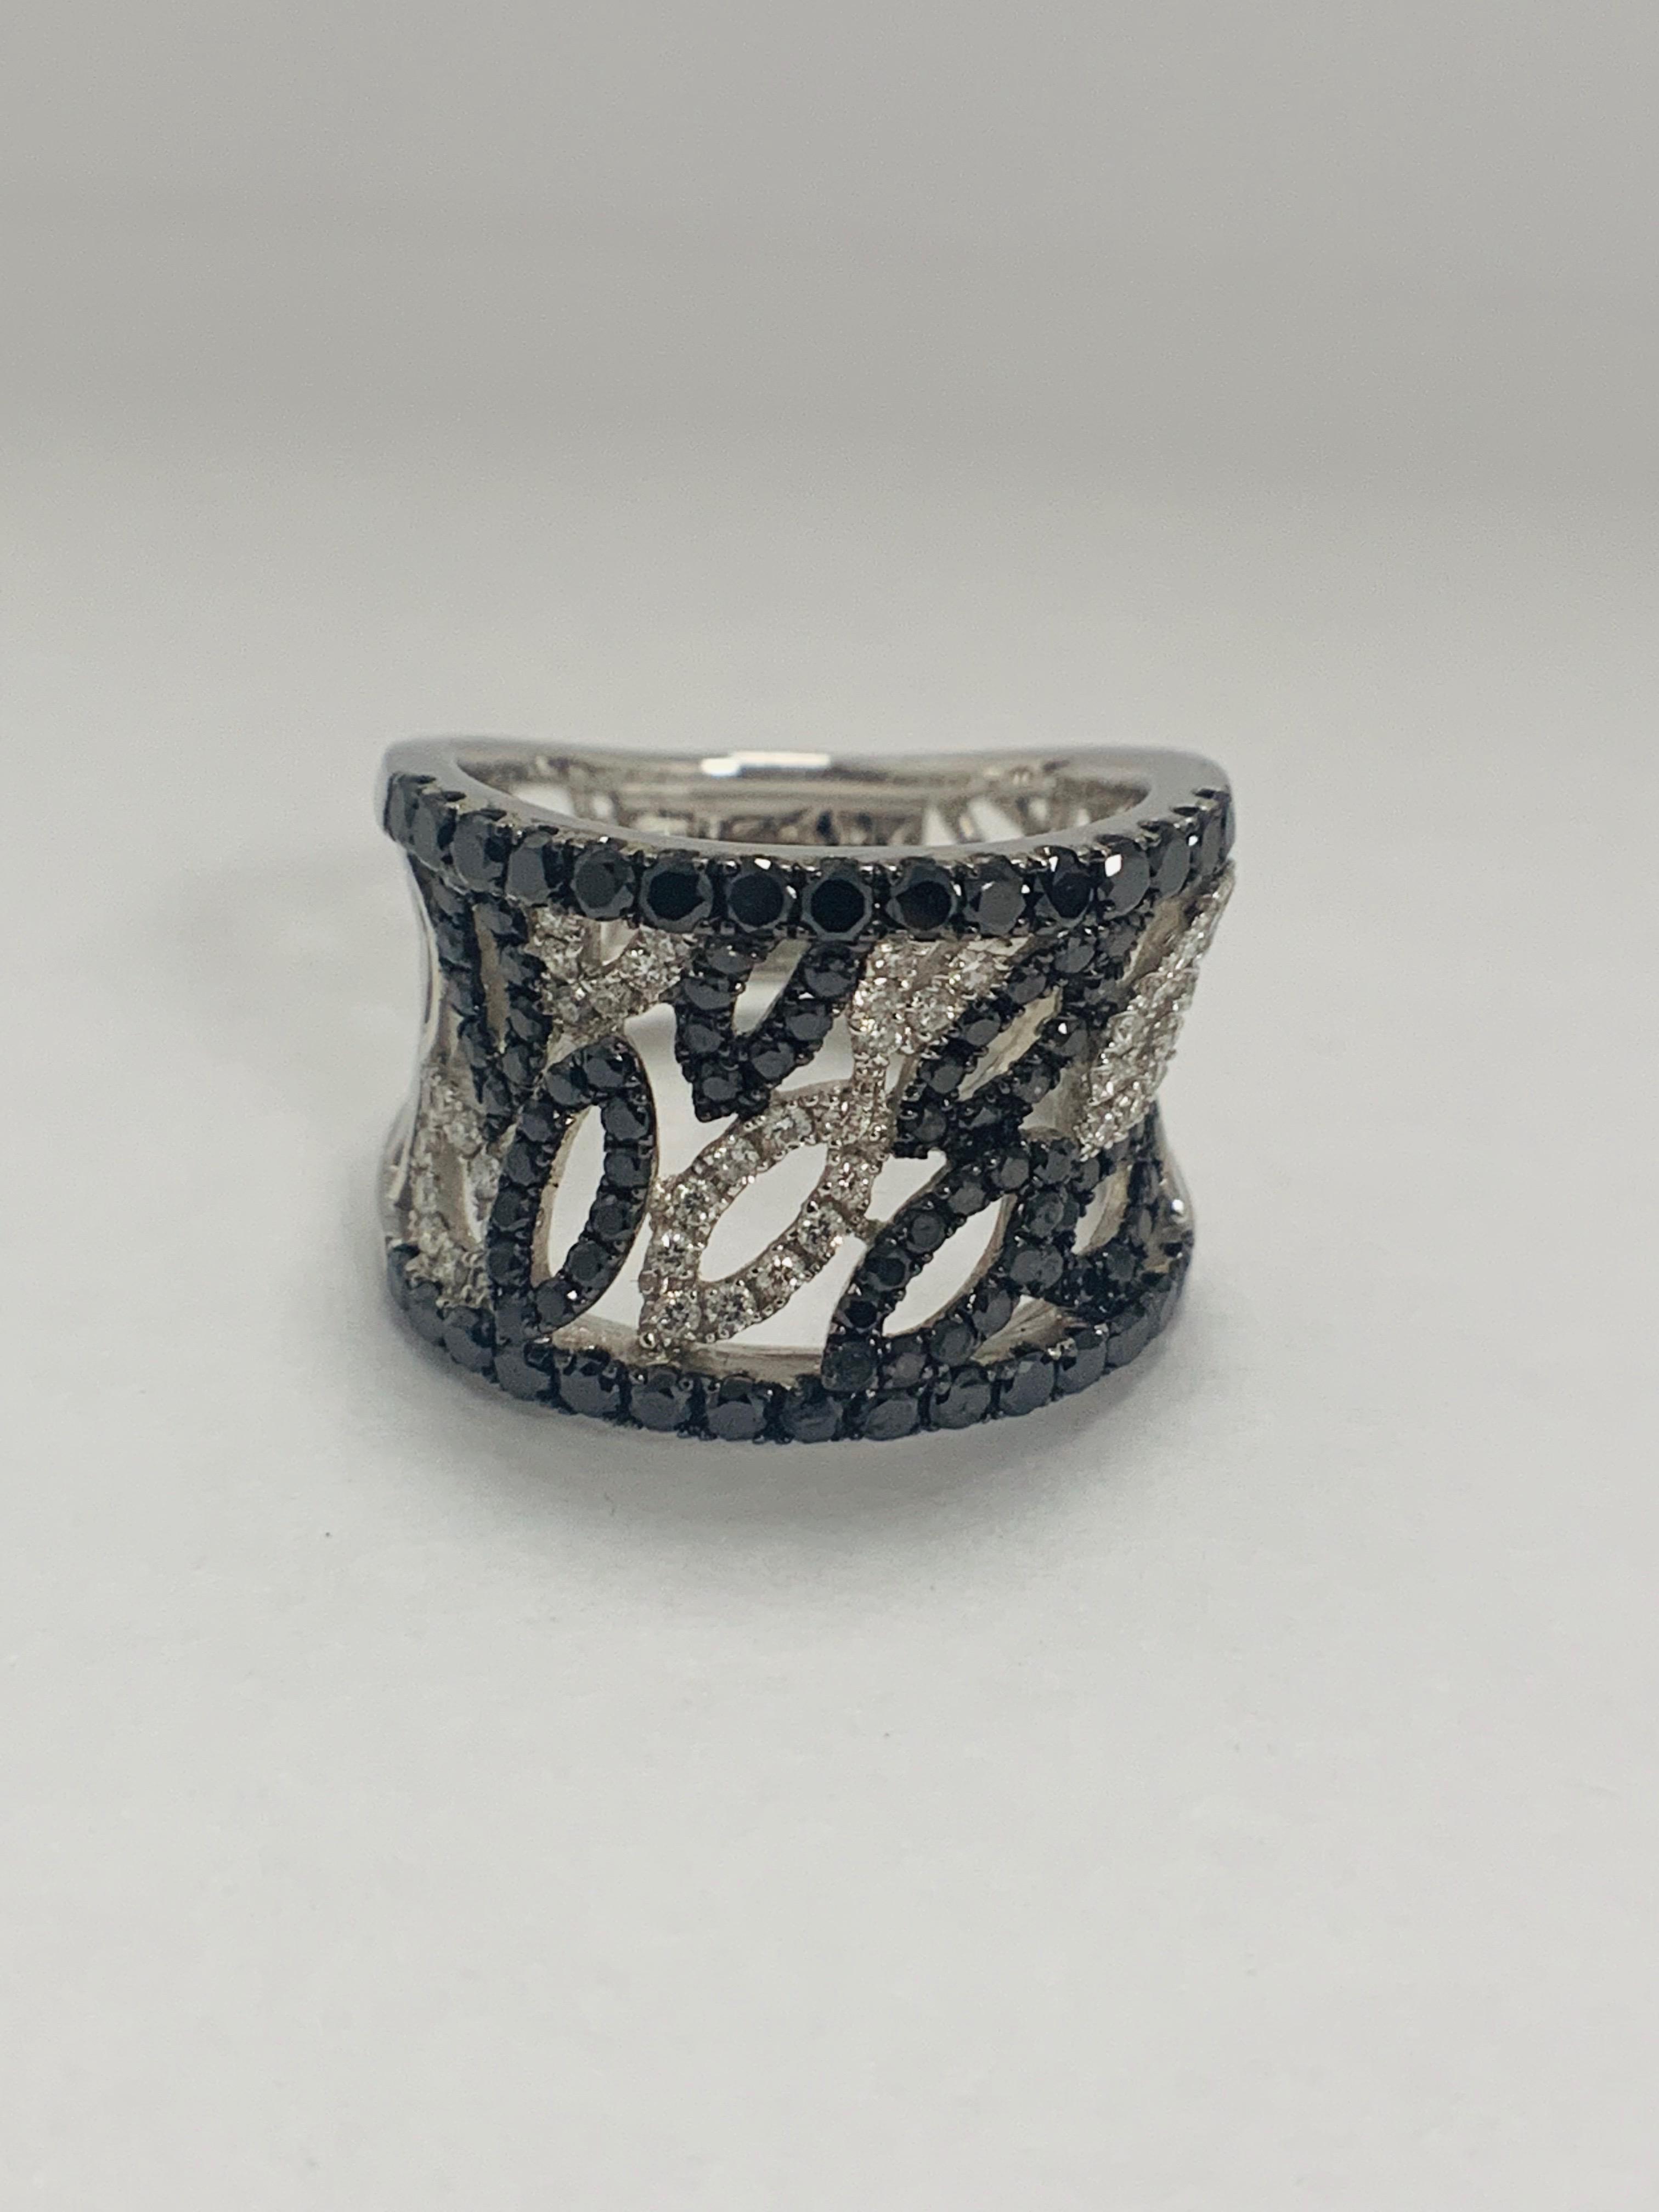 18ct White Gold Diamond ring featuring 90 round cut, black Diamonds (1.14ct TBDW) - Image 2 of 15